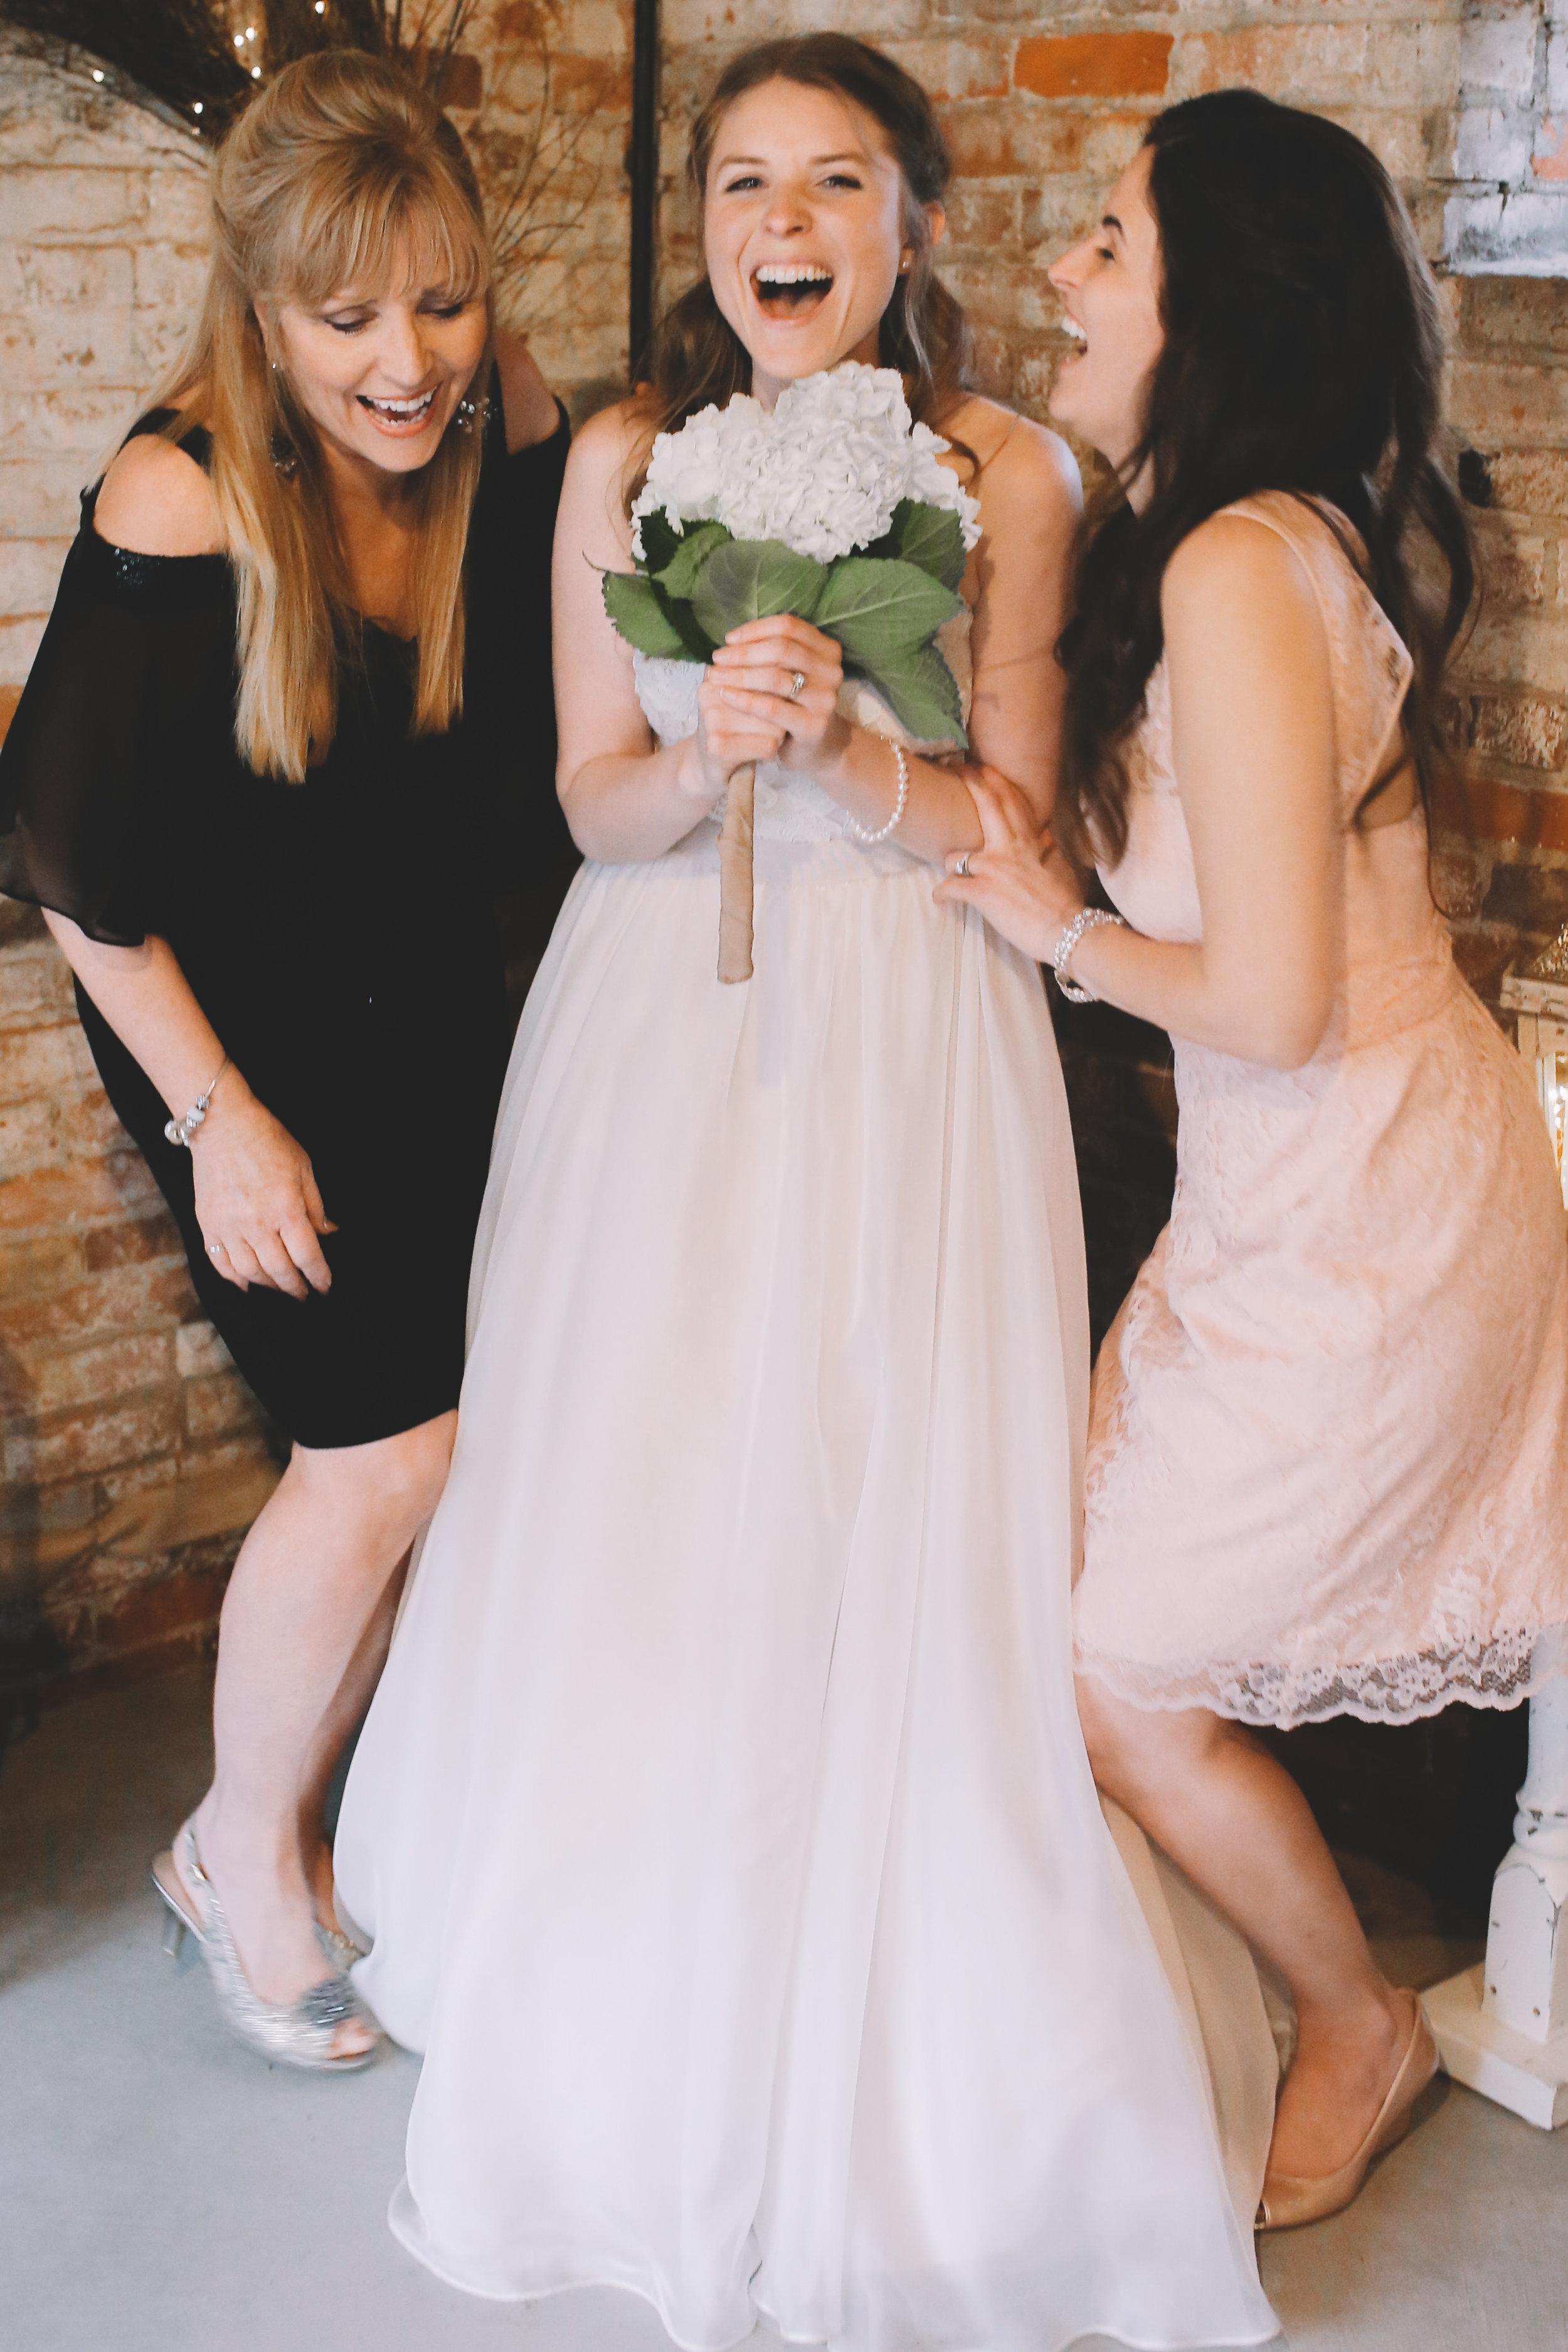 Jake + Brittney Balbas Airbnb Carriage House Wedding Evansville IN (172 of 426).jpg